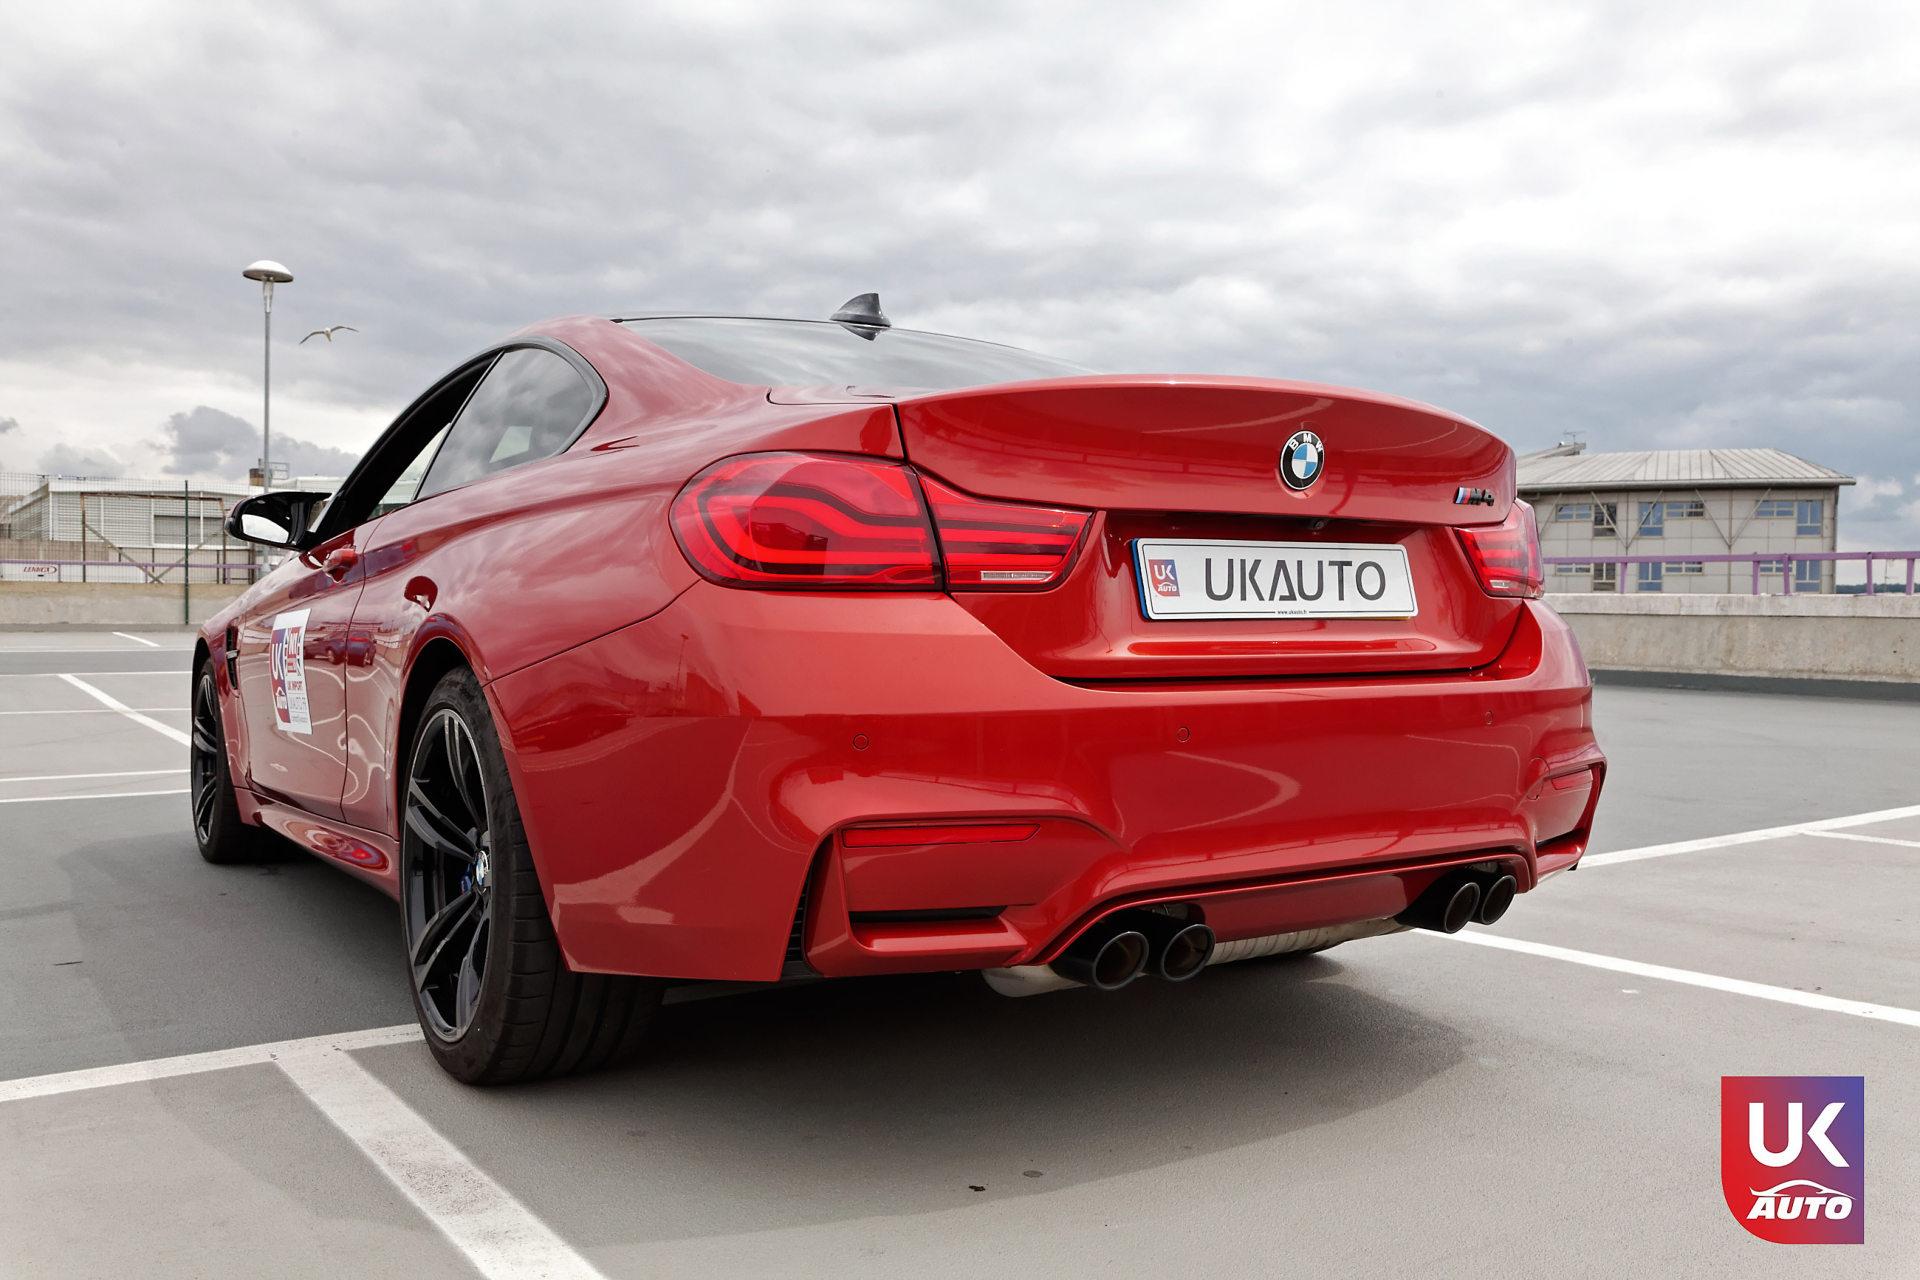 BMW M4 PACK COMPETITION BMW ANGLETERRE BMW IMPORT UK BMW MANDATAIRE AUTO3 DxO - IMPORTATION BMW M4 BMW IMPORT ROYAUME UNI BMW M4 COMPETITION RHD CLIENT UKAUTO